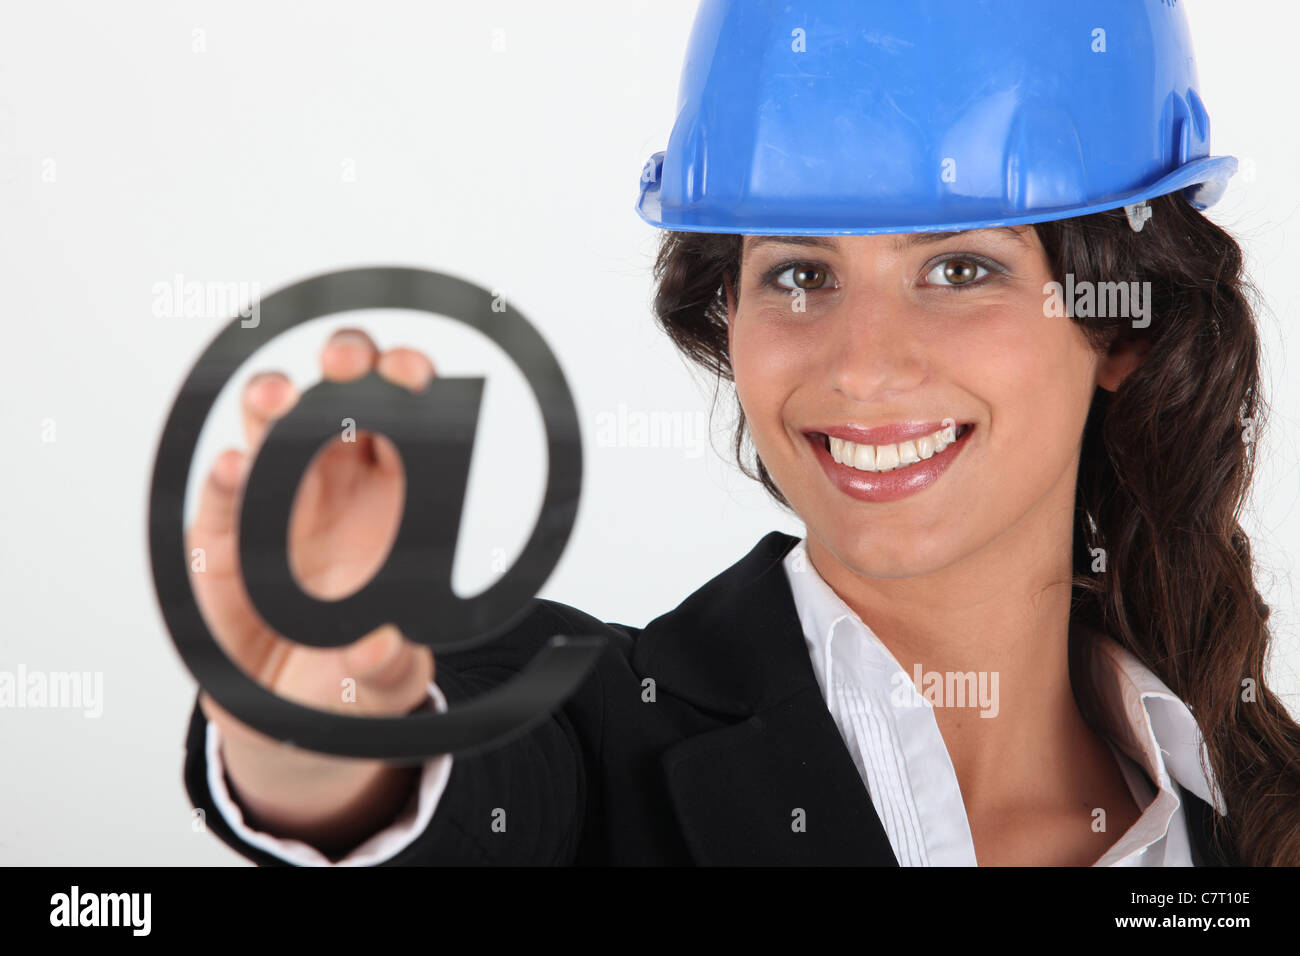 Brunette holding at symbol - Stock Image